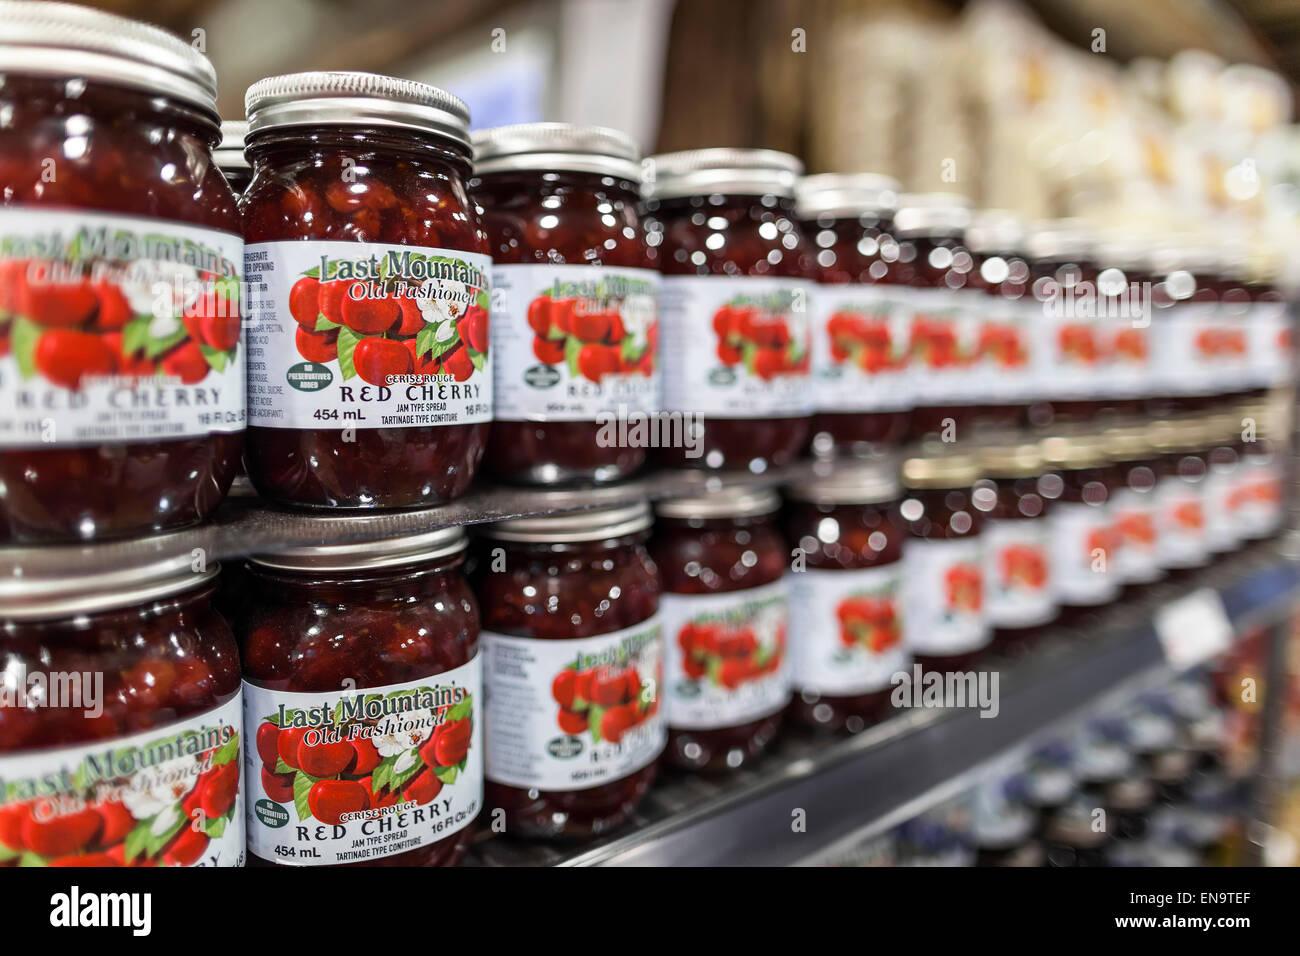 Jars of Red Cherry Jam - Stock Image